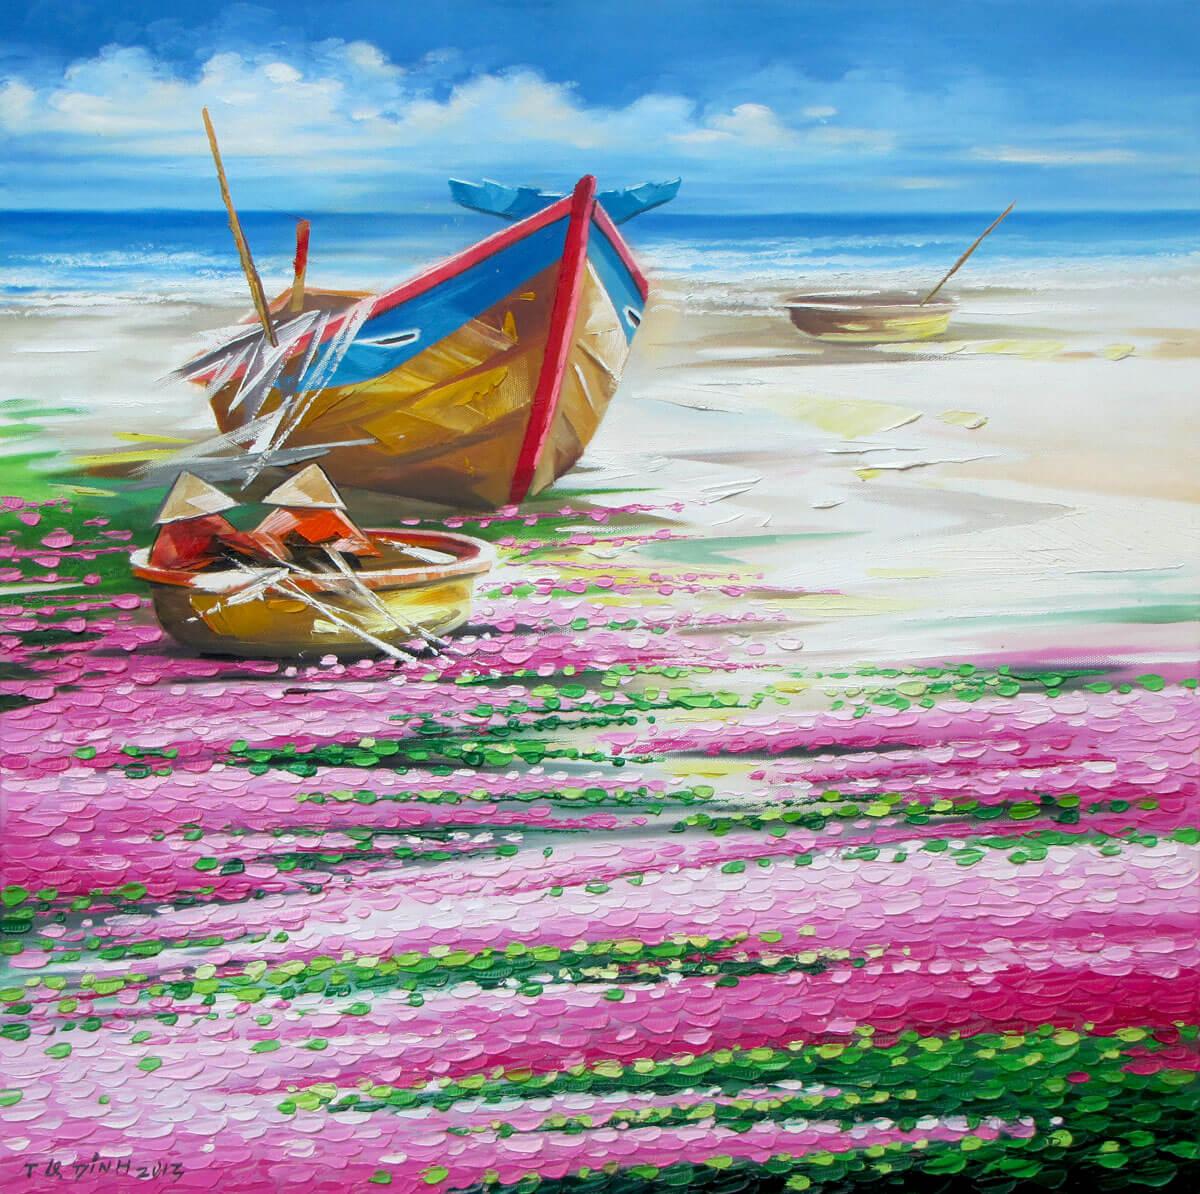 Water-morning glory 5-Original Asian Art